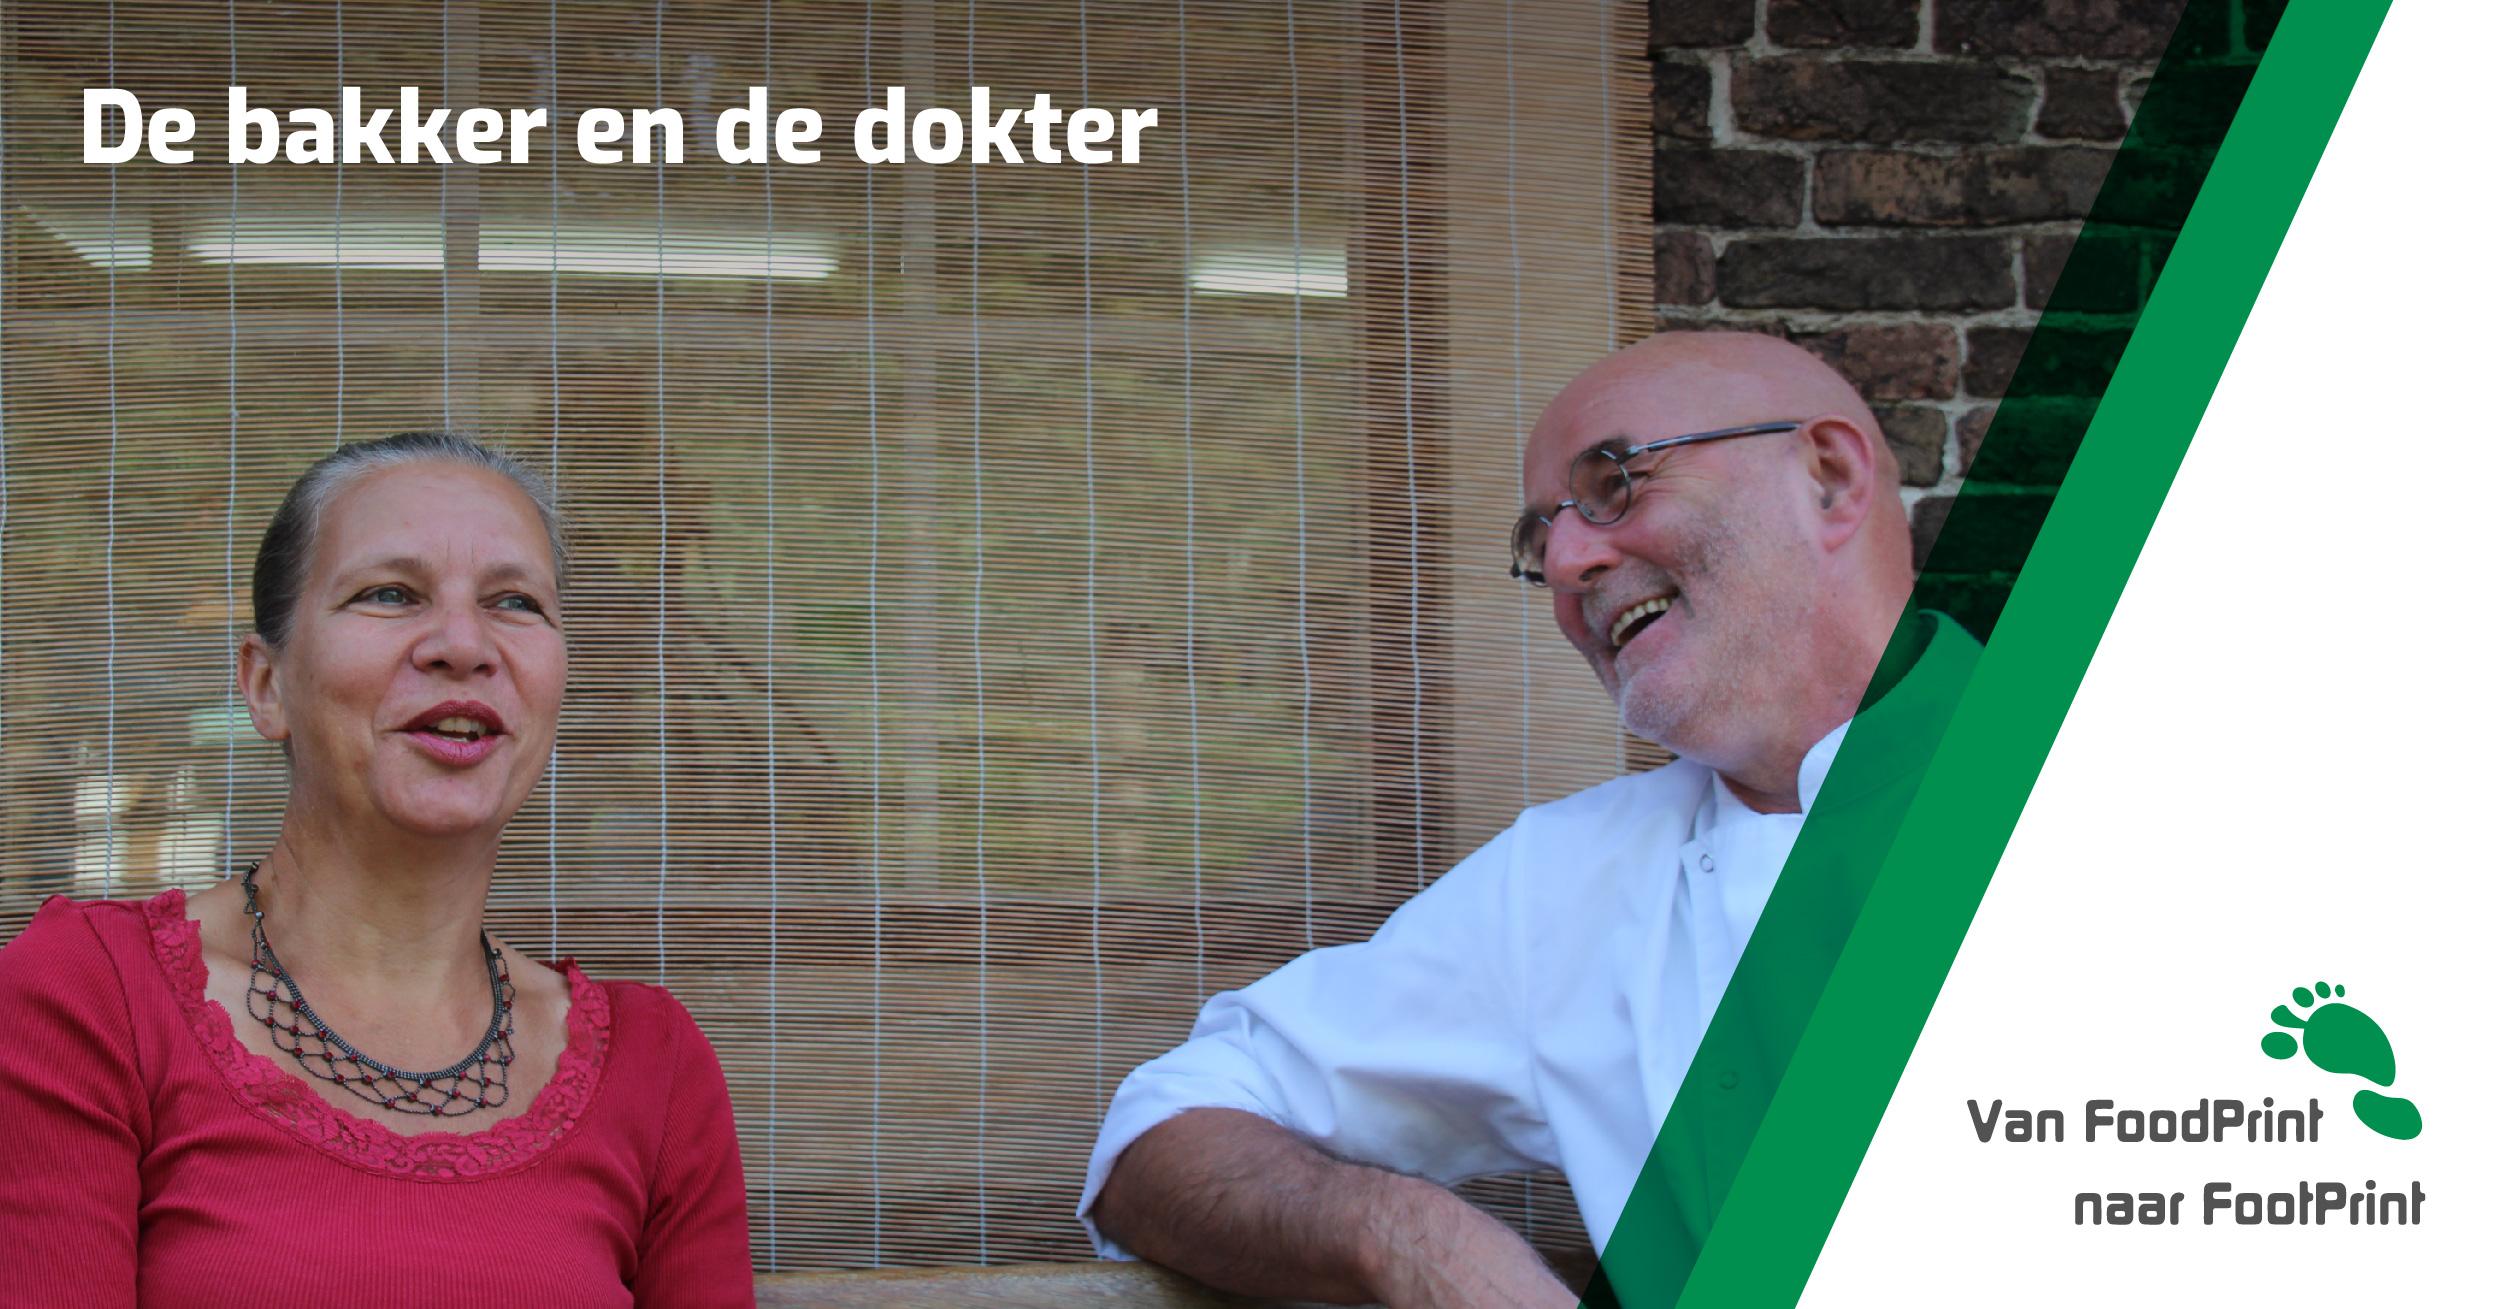 Bakker Gerard Hardeman en natuurarts Trudy Vlot over hun samenwerking